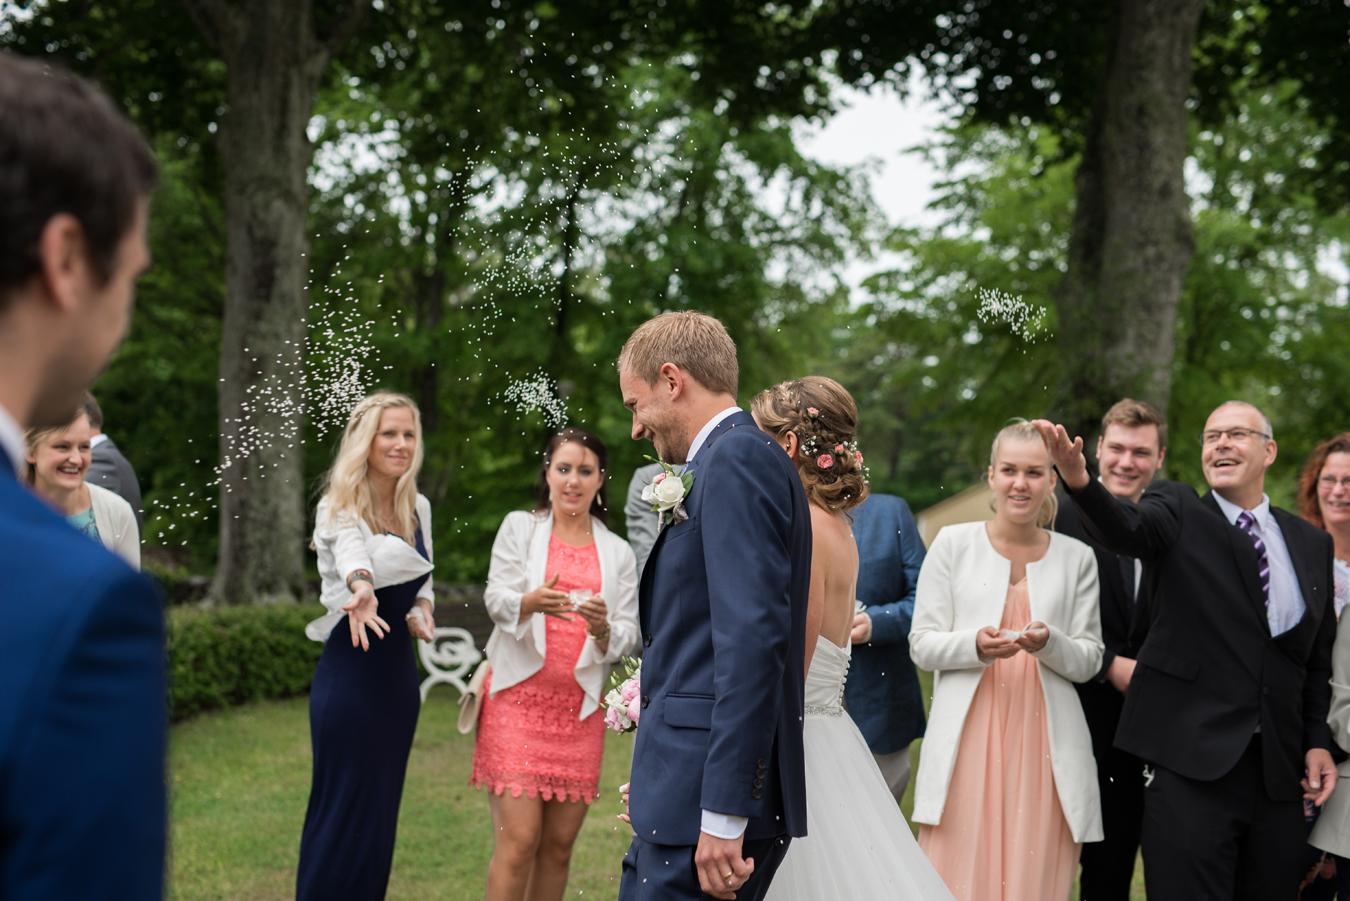 010-bröllopsfotograf-folhammar-gotland-neas-fotografi.jpg